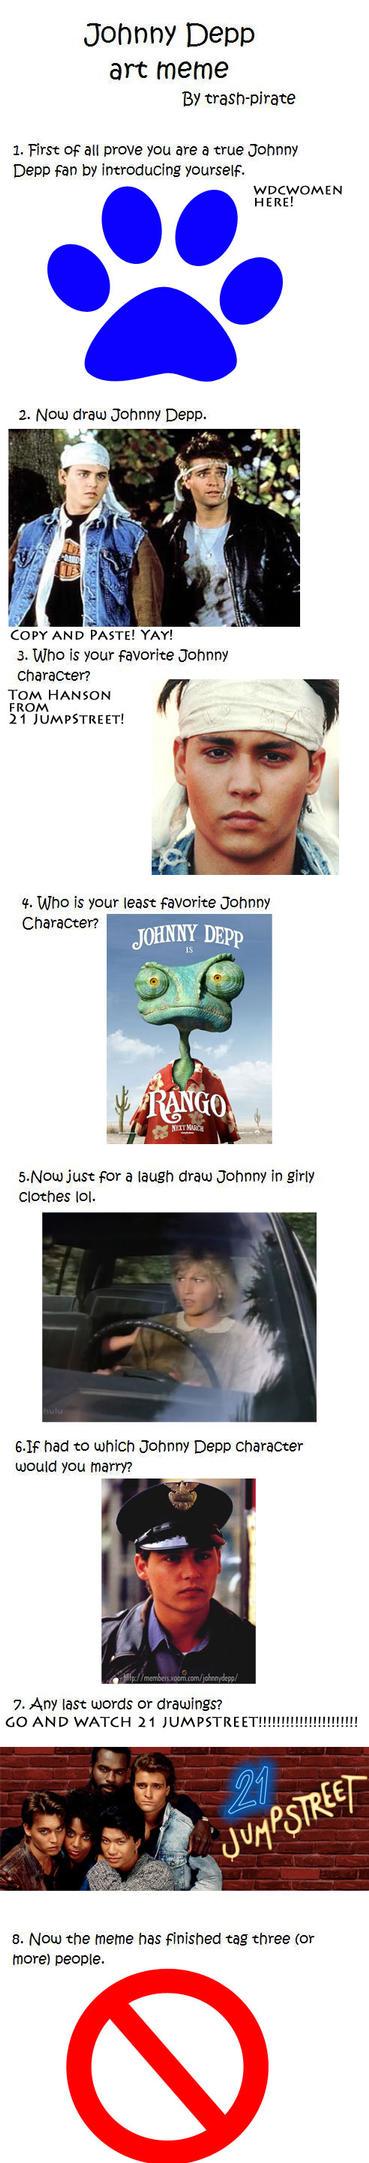 Johnny Depp Meme by wdcwomen on DeviantArt